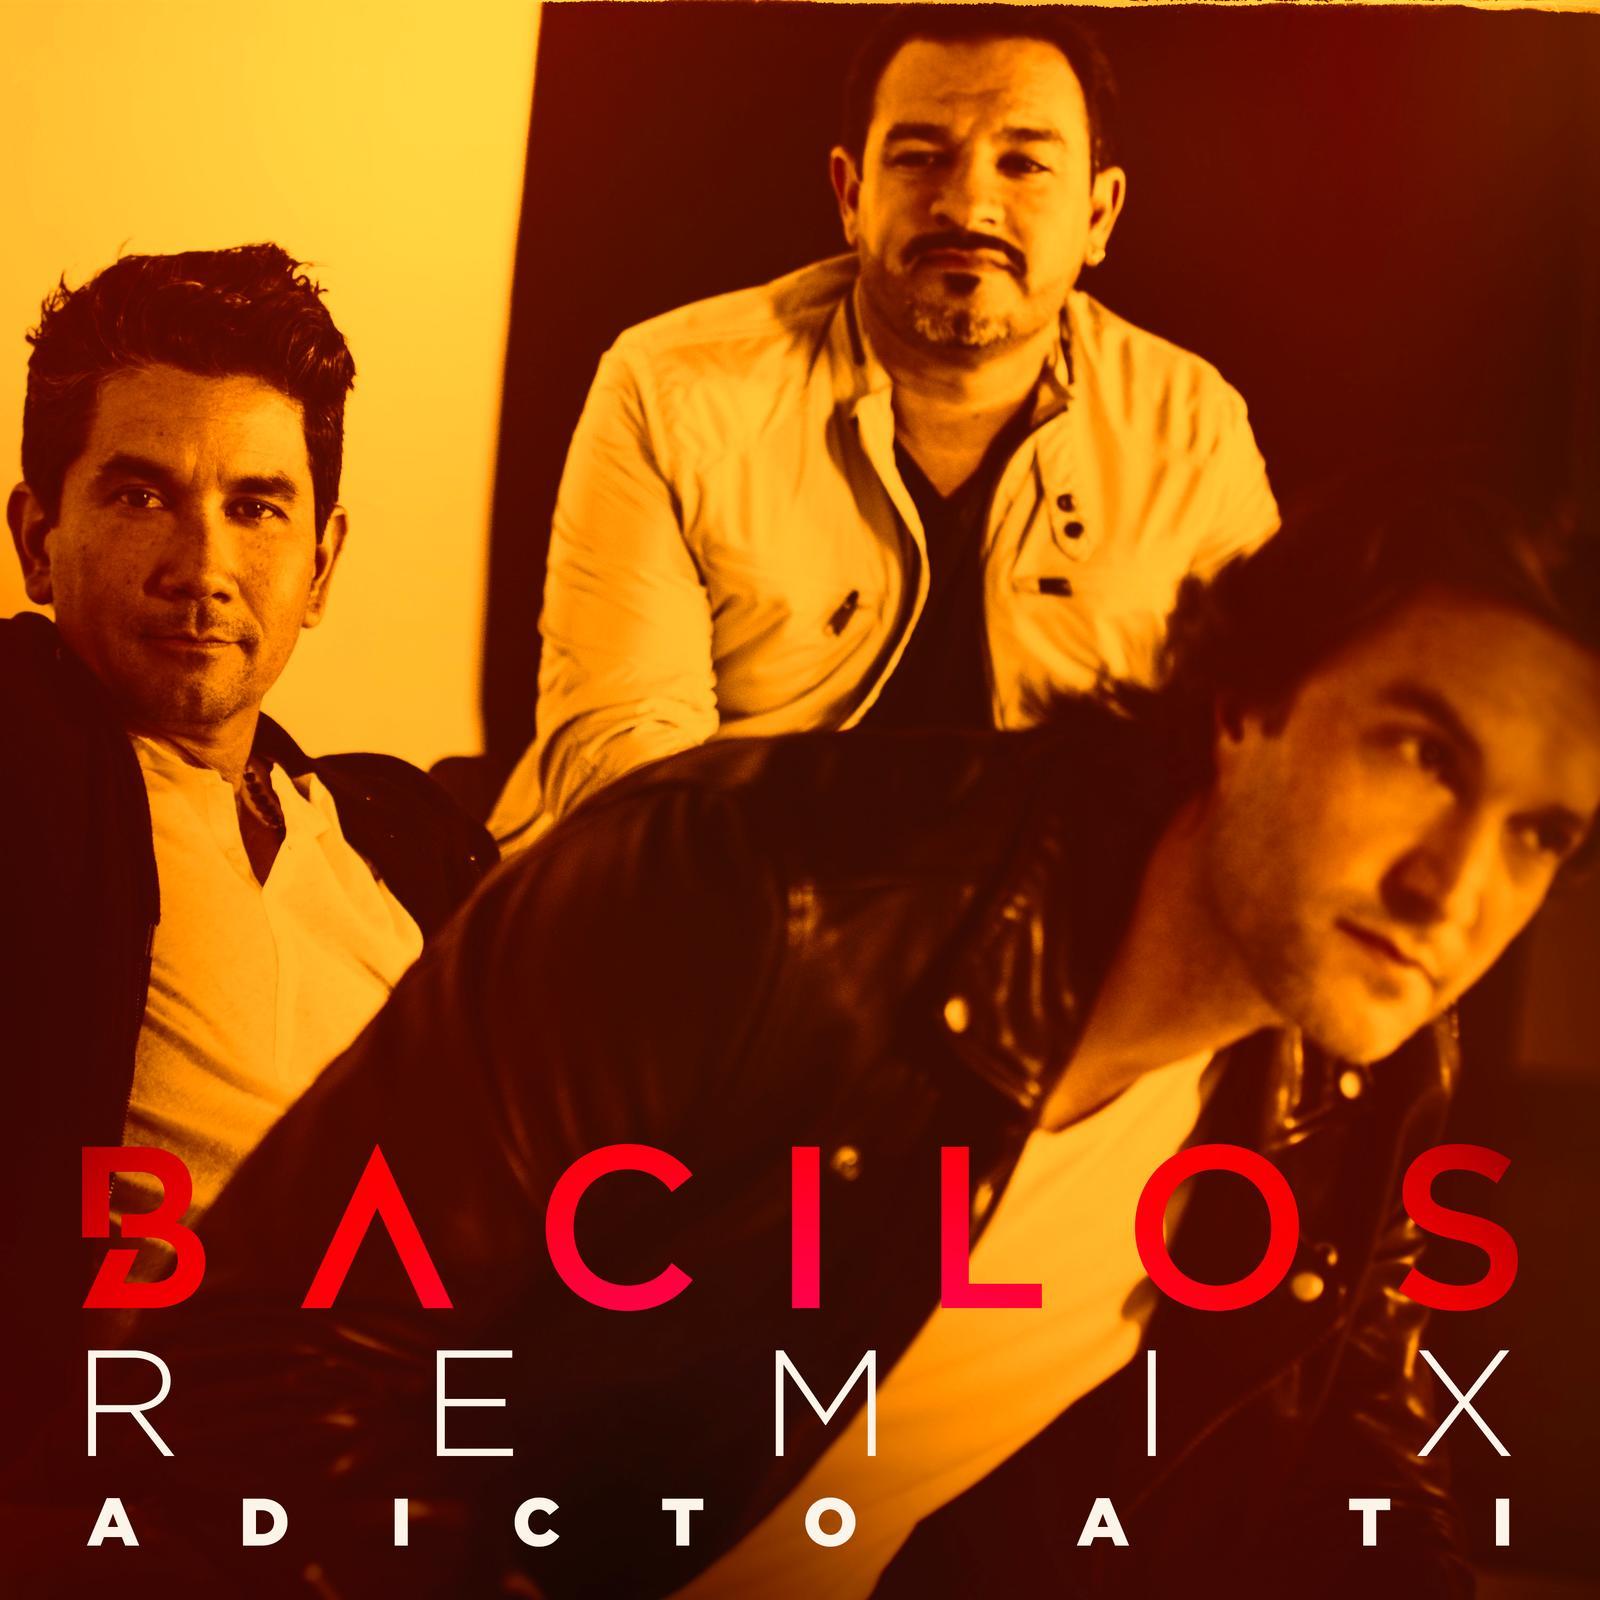 Bacilos_AdictoATiRemix